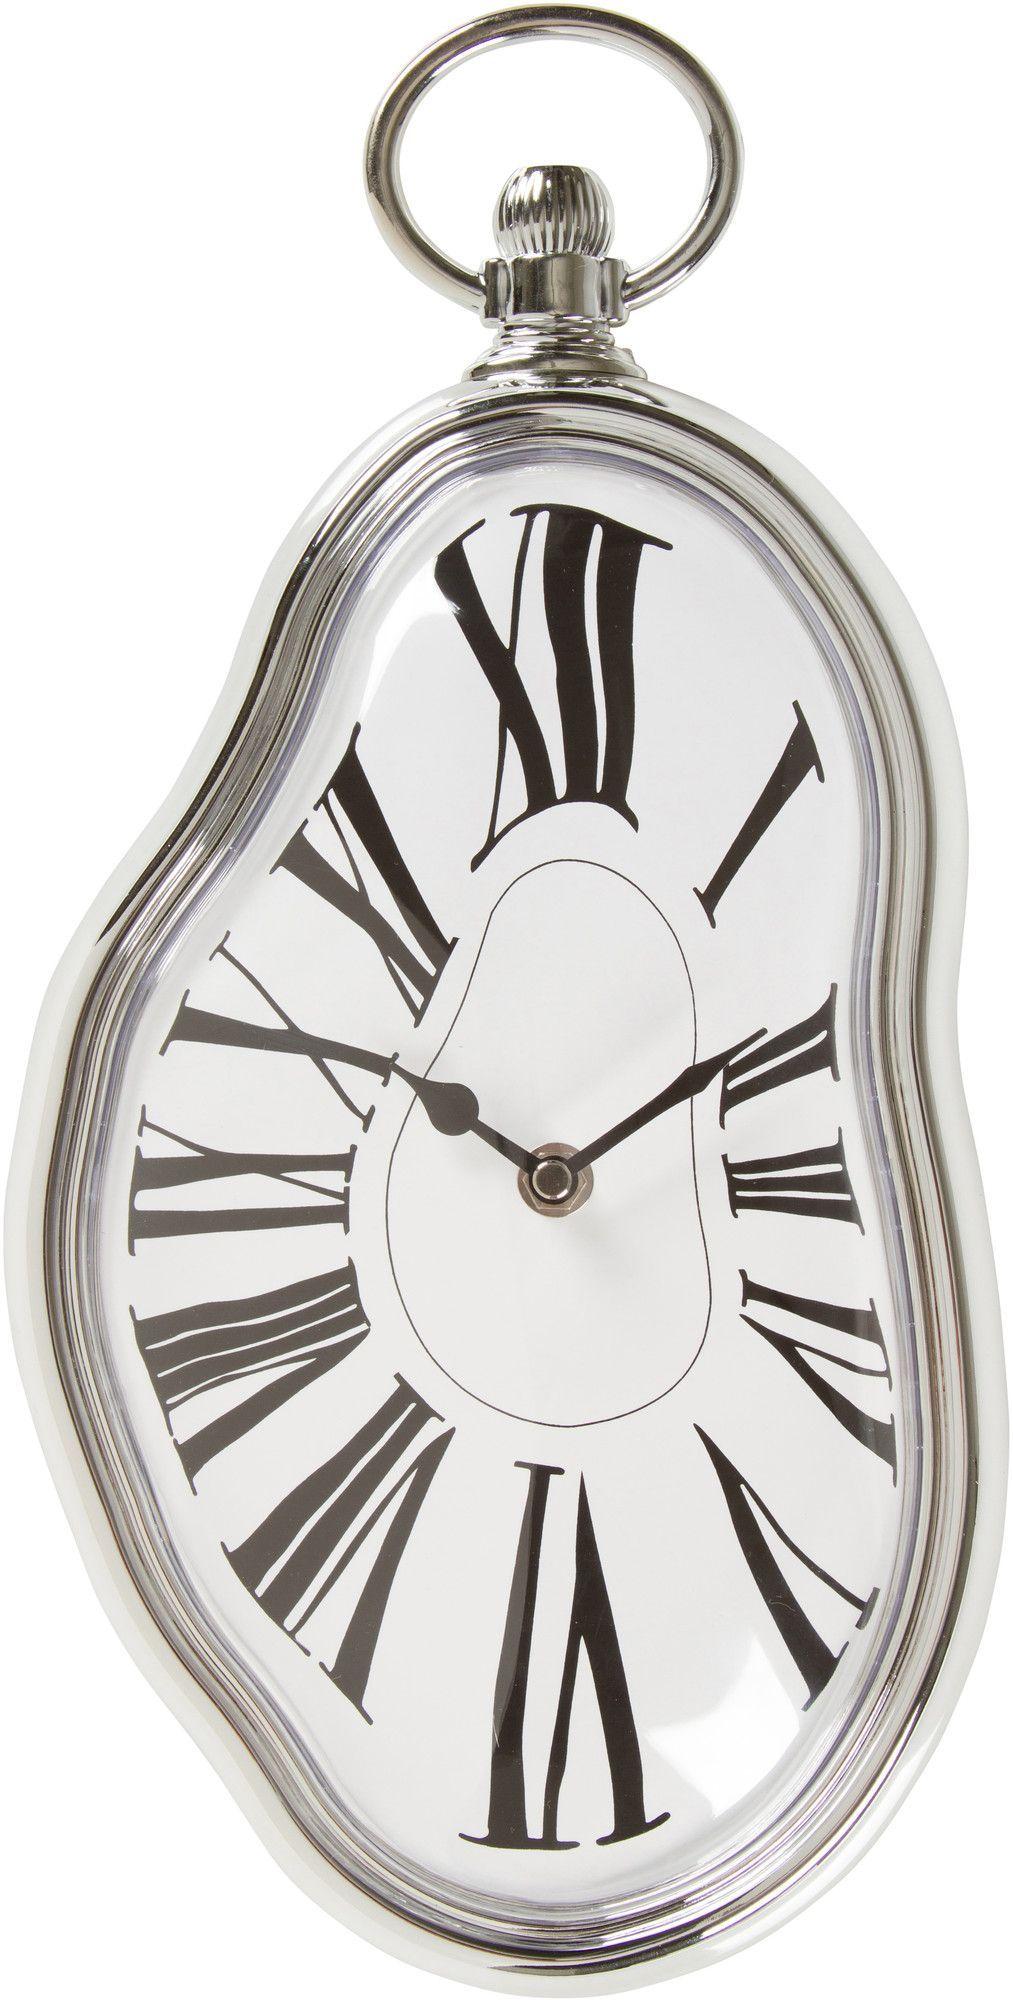 Over Sized Garfield 28 Quot Wall Clock Melting Clock Clock